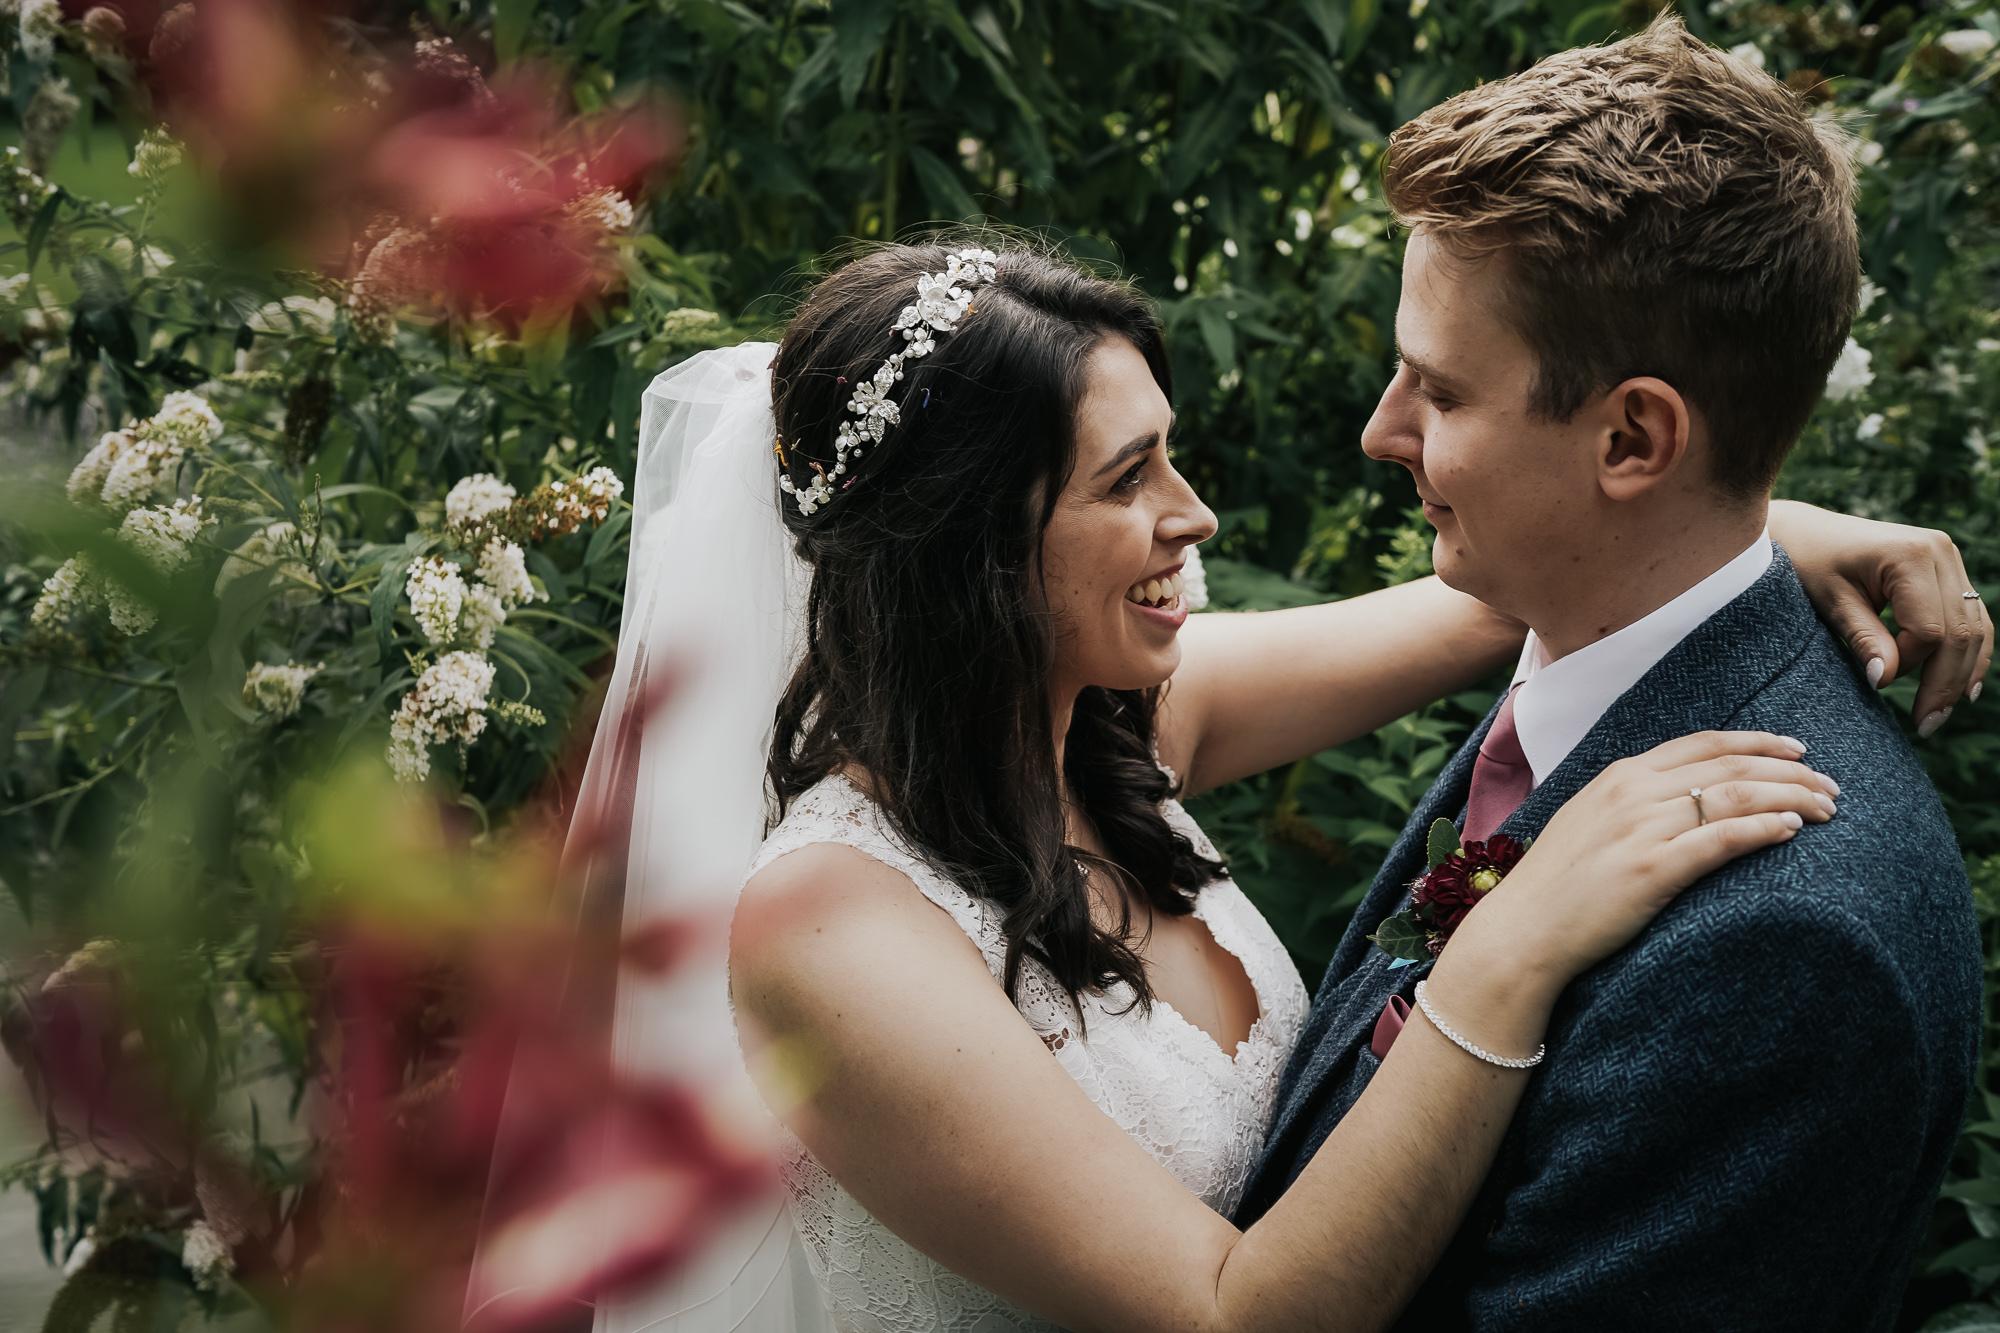 Oak tree of peover wedding photography cheshire wedding photographer (39 of 56).jpg